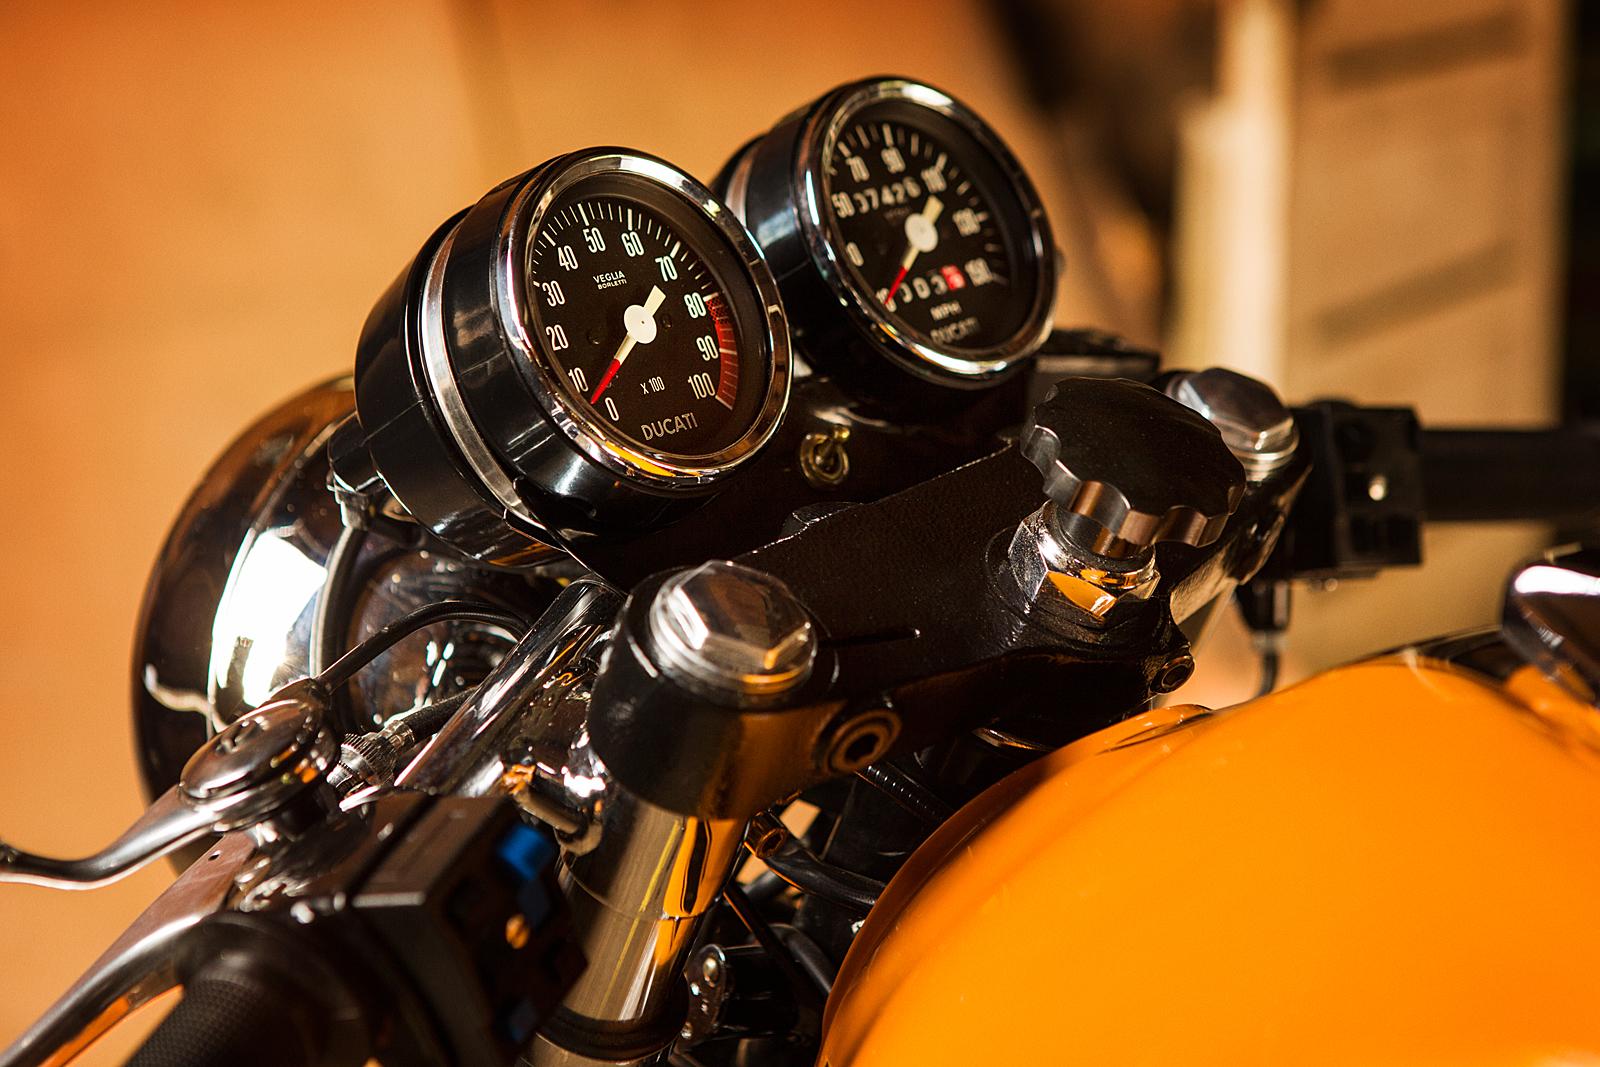 1974 Ducati 750S Sport speedometre VEGLIA